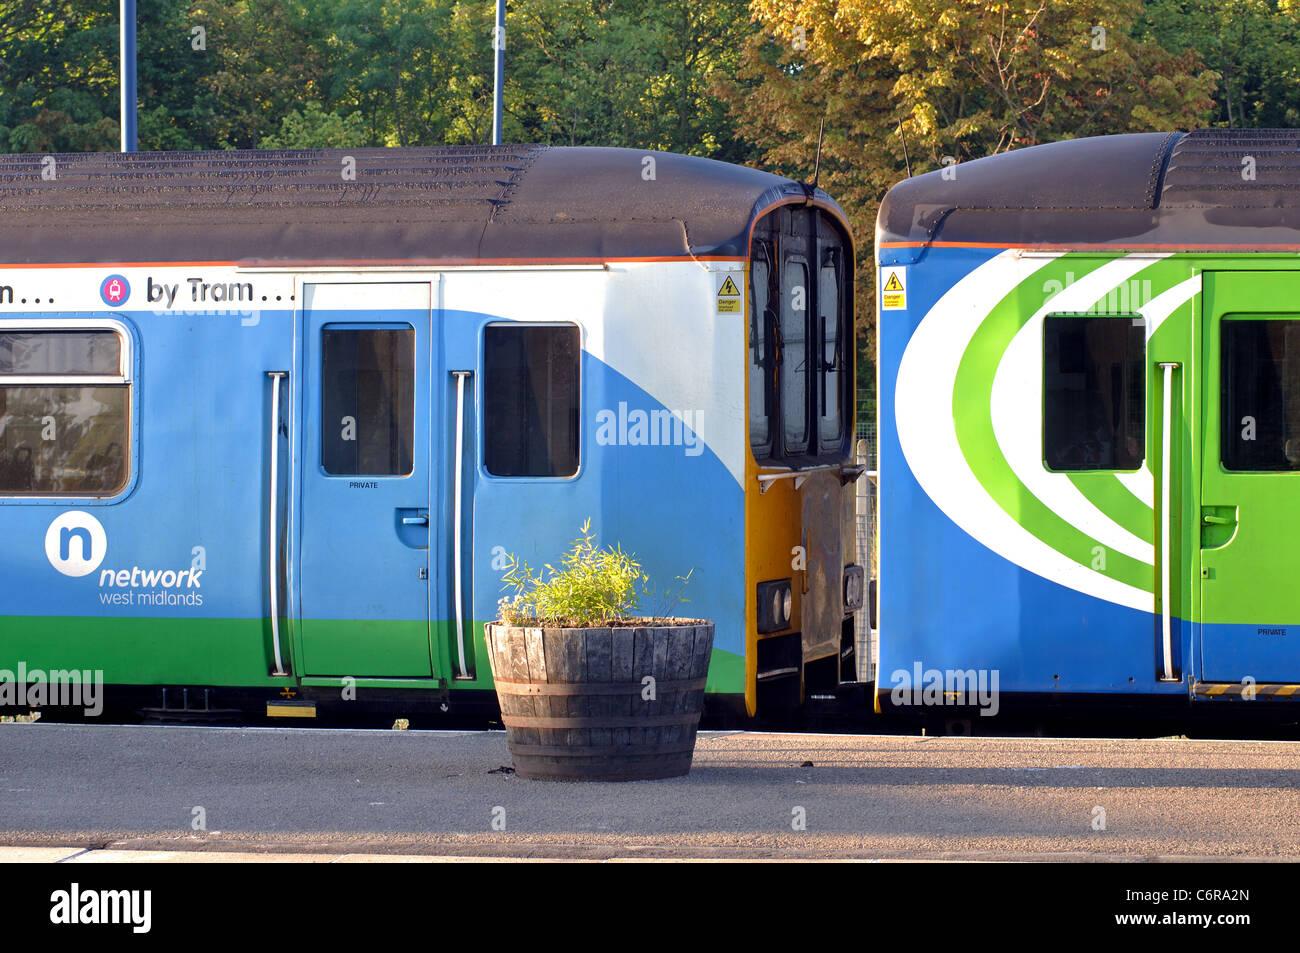 Network West Midlands trains at Leamington Spa railway station, Warwickshire, England, UK - Stock Image